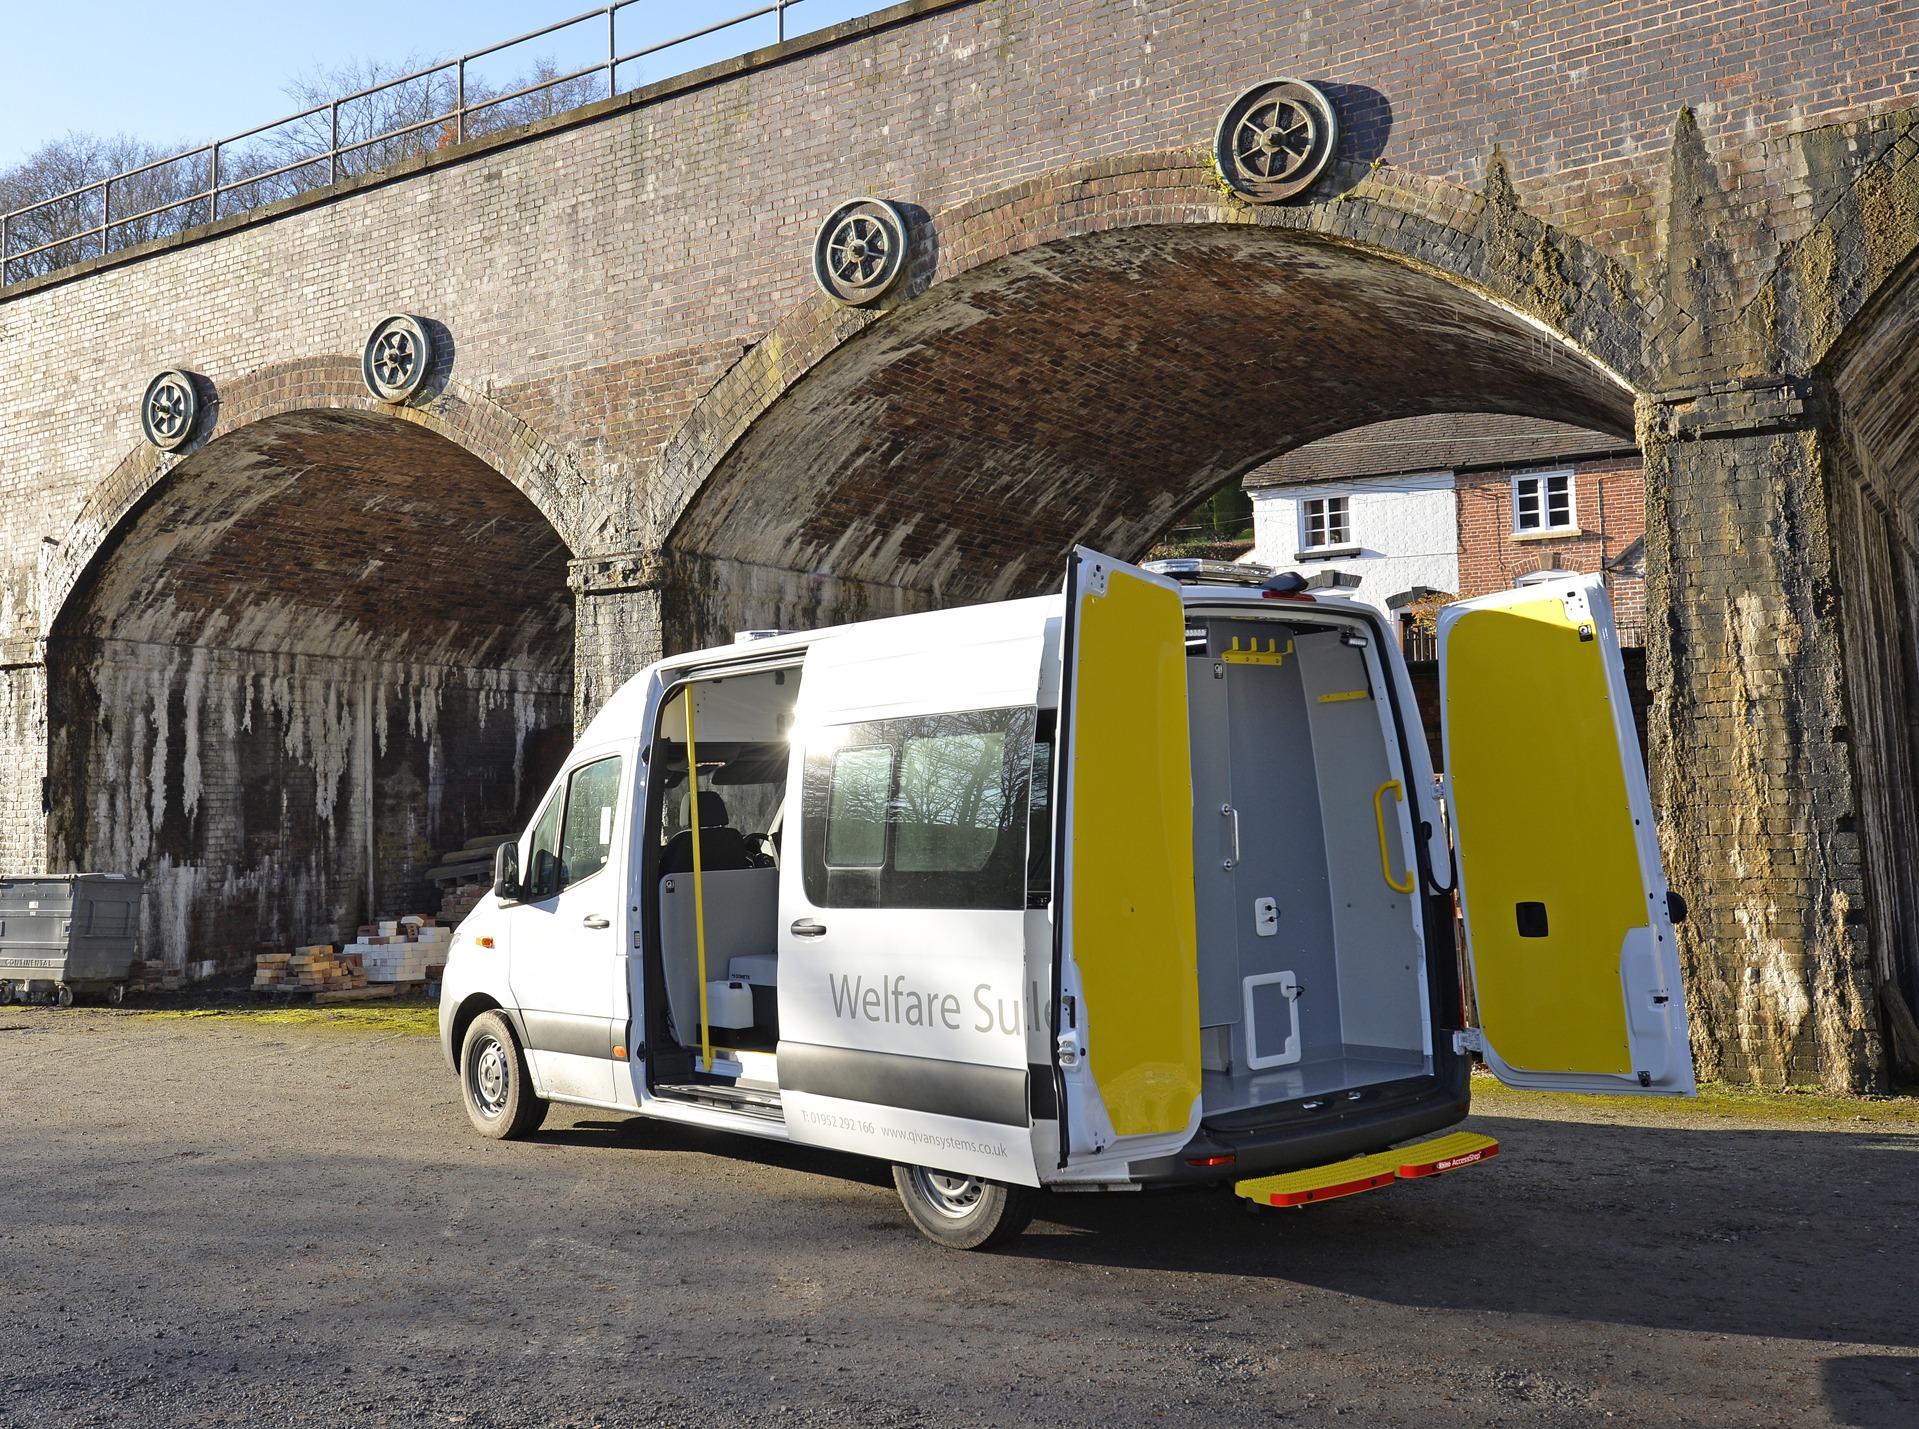 Welfare Vehicles Welfare Vehicles